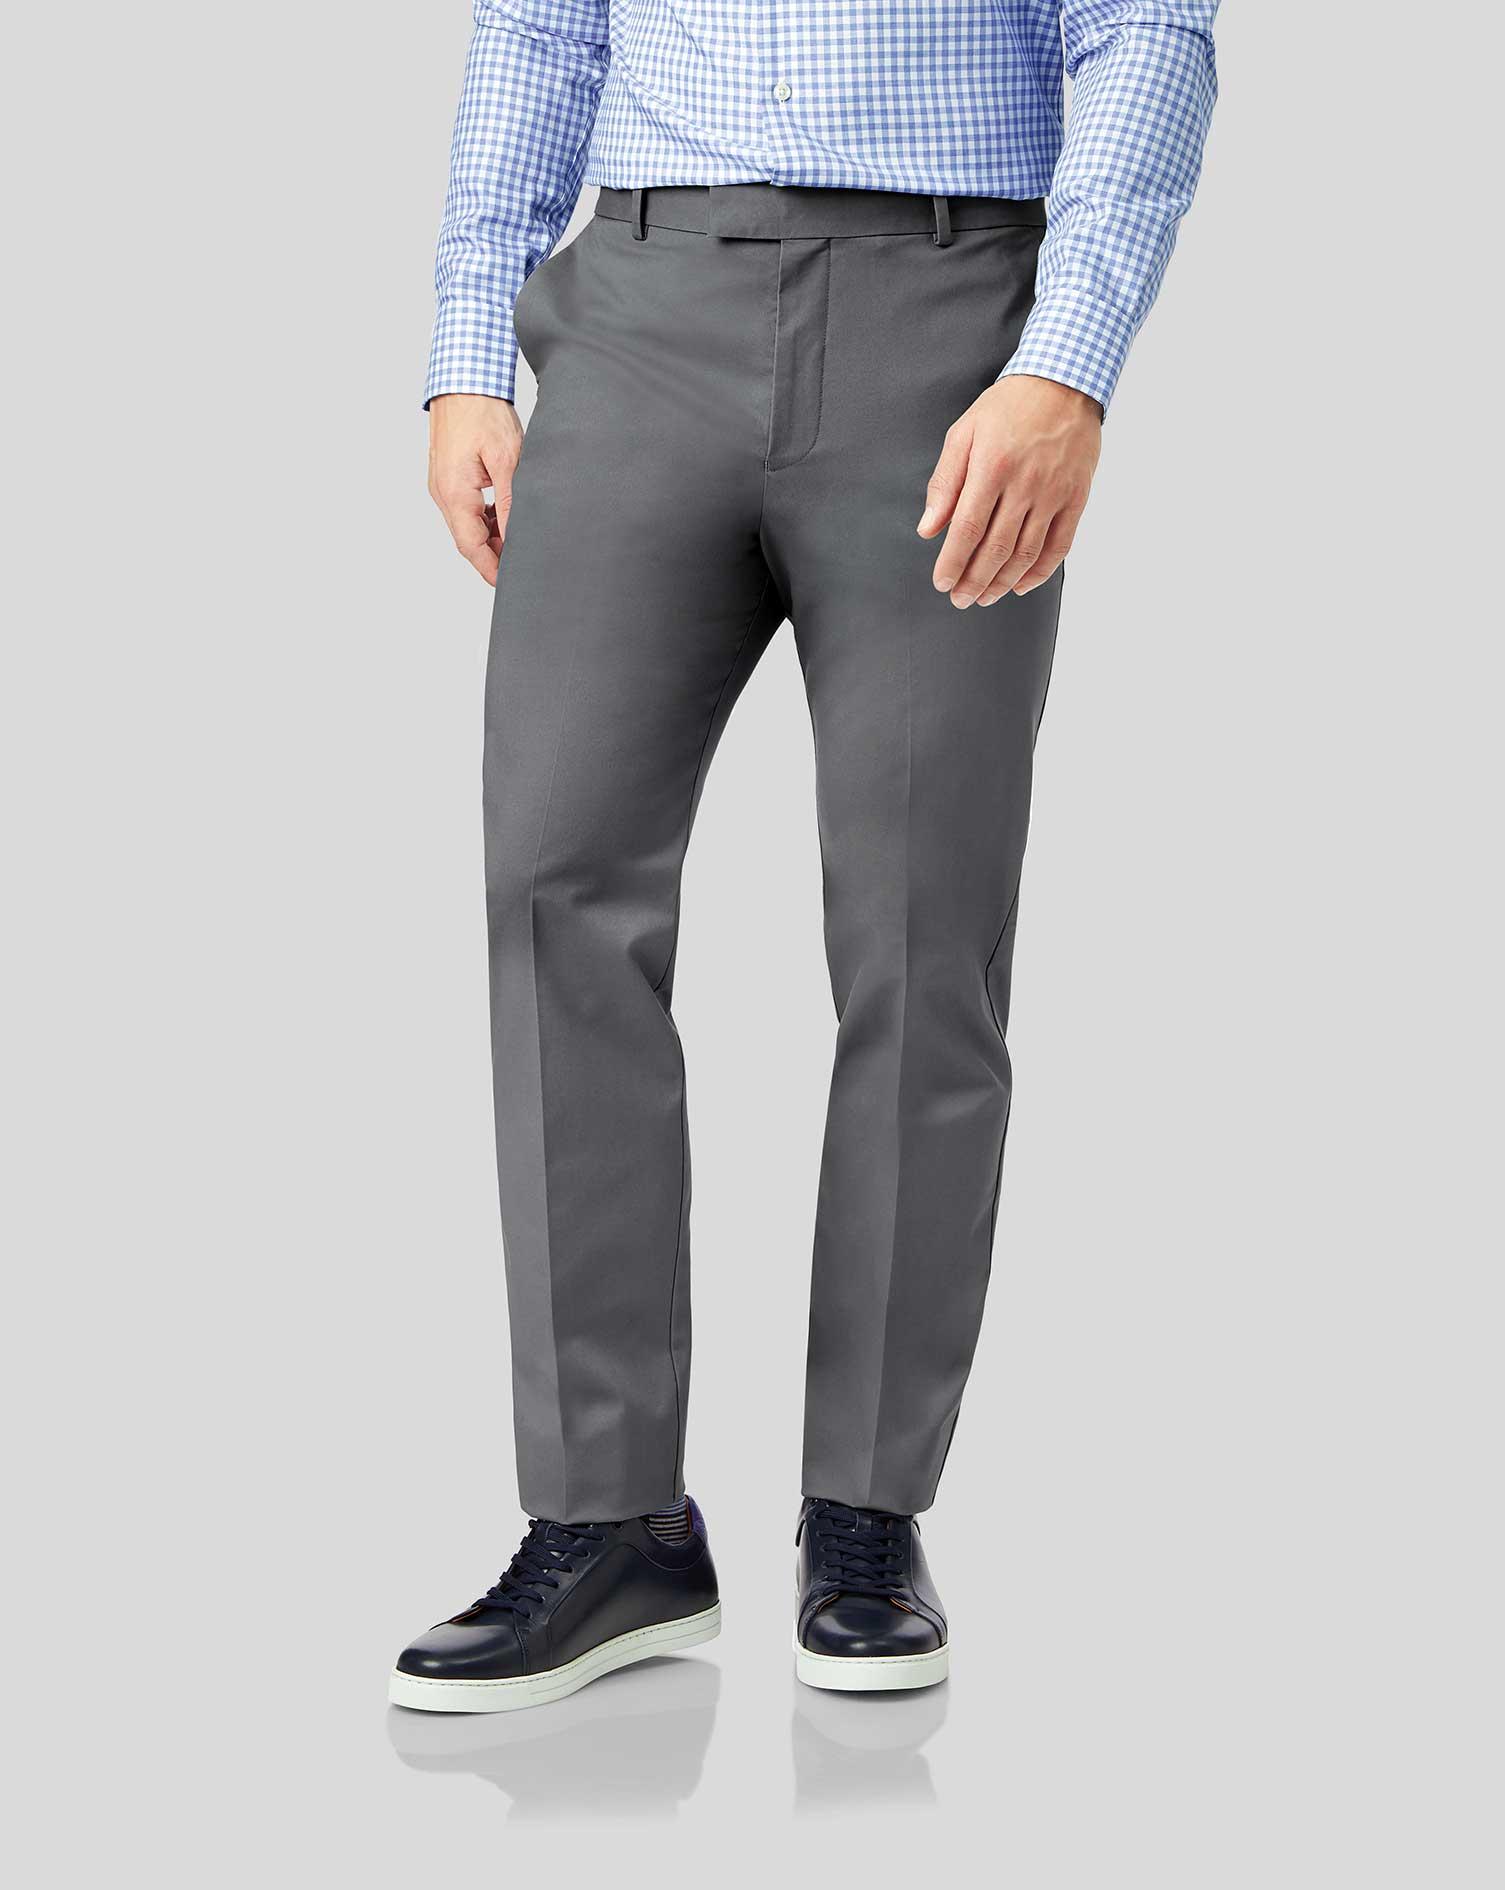 Cotton Grey Flat Front Non-Iron Chinos